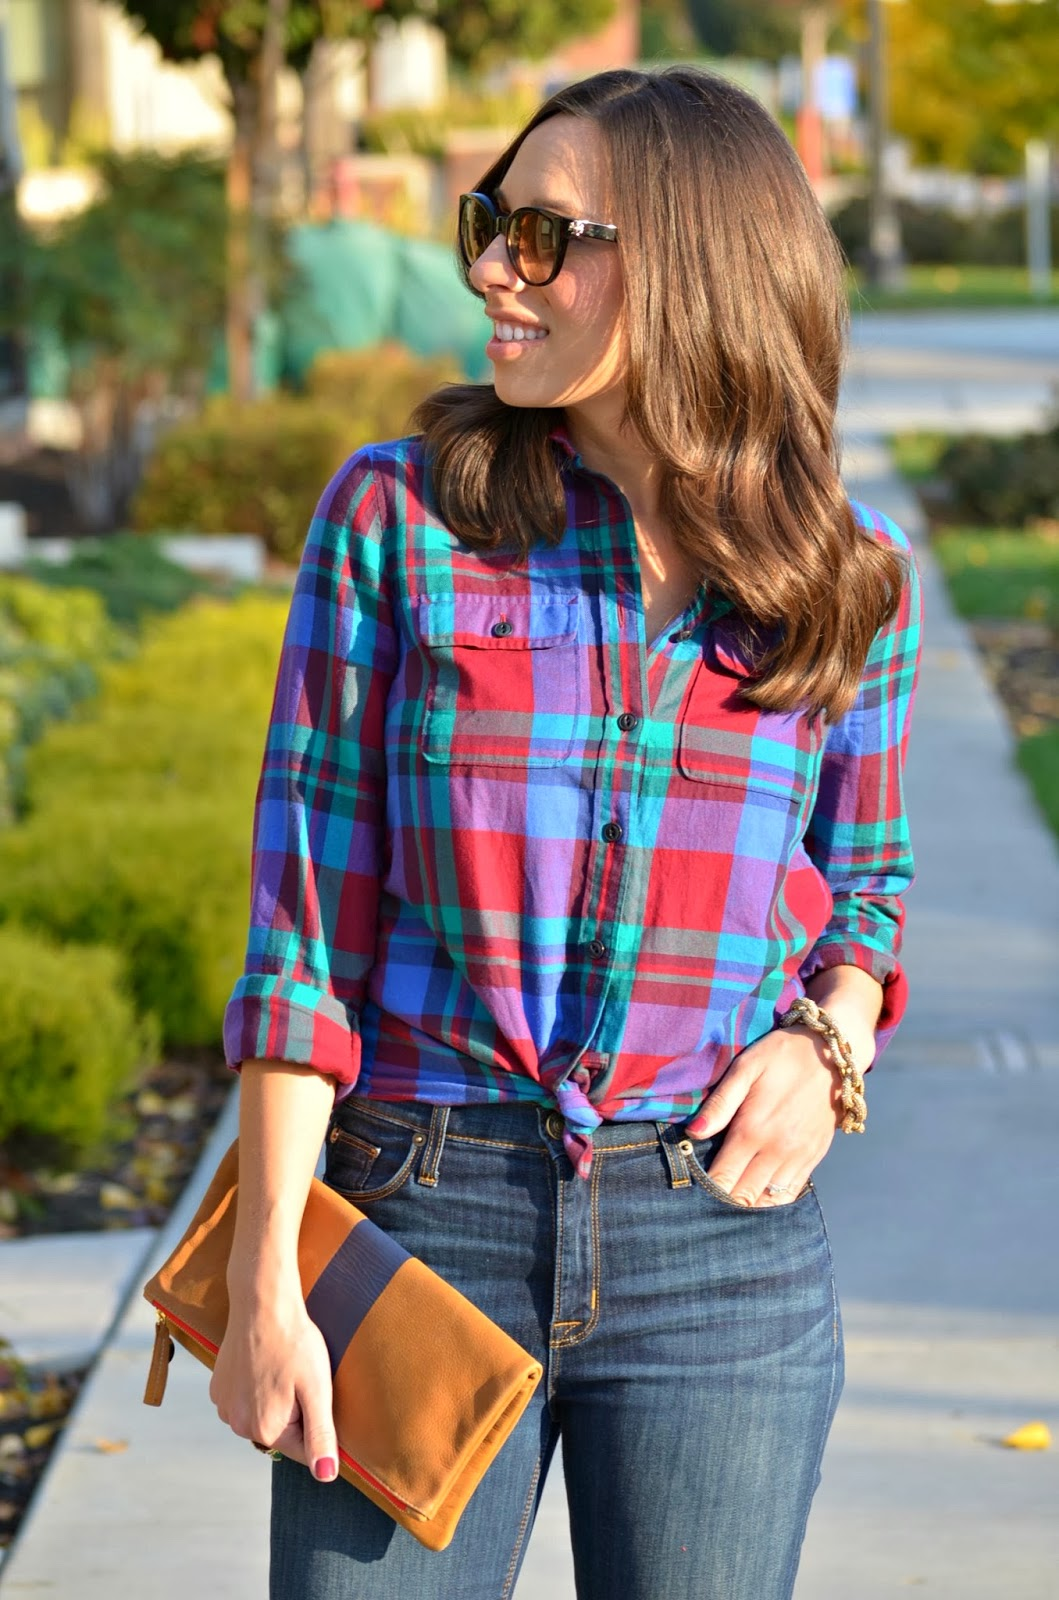 Dressing up a flannel shirt